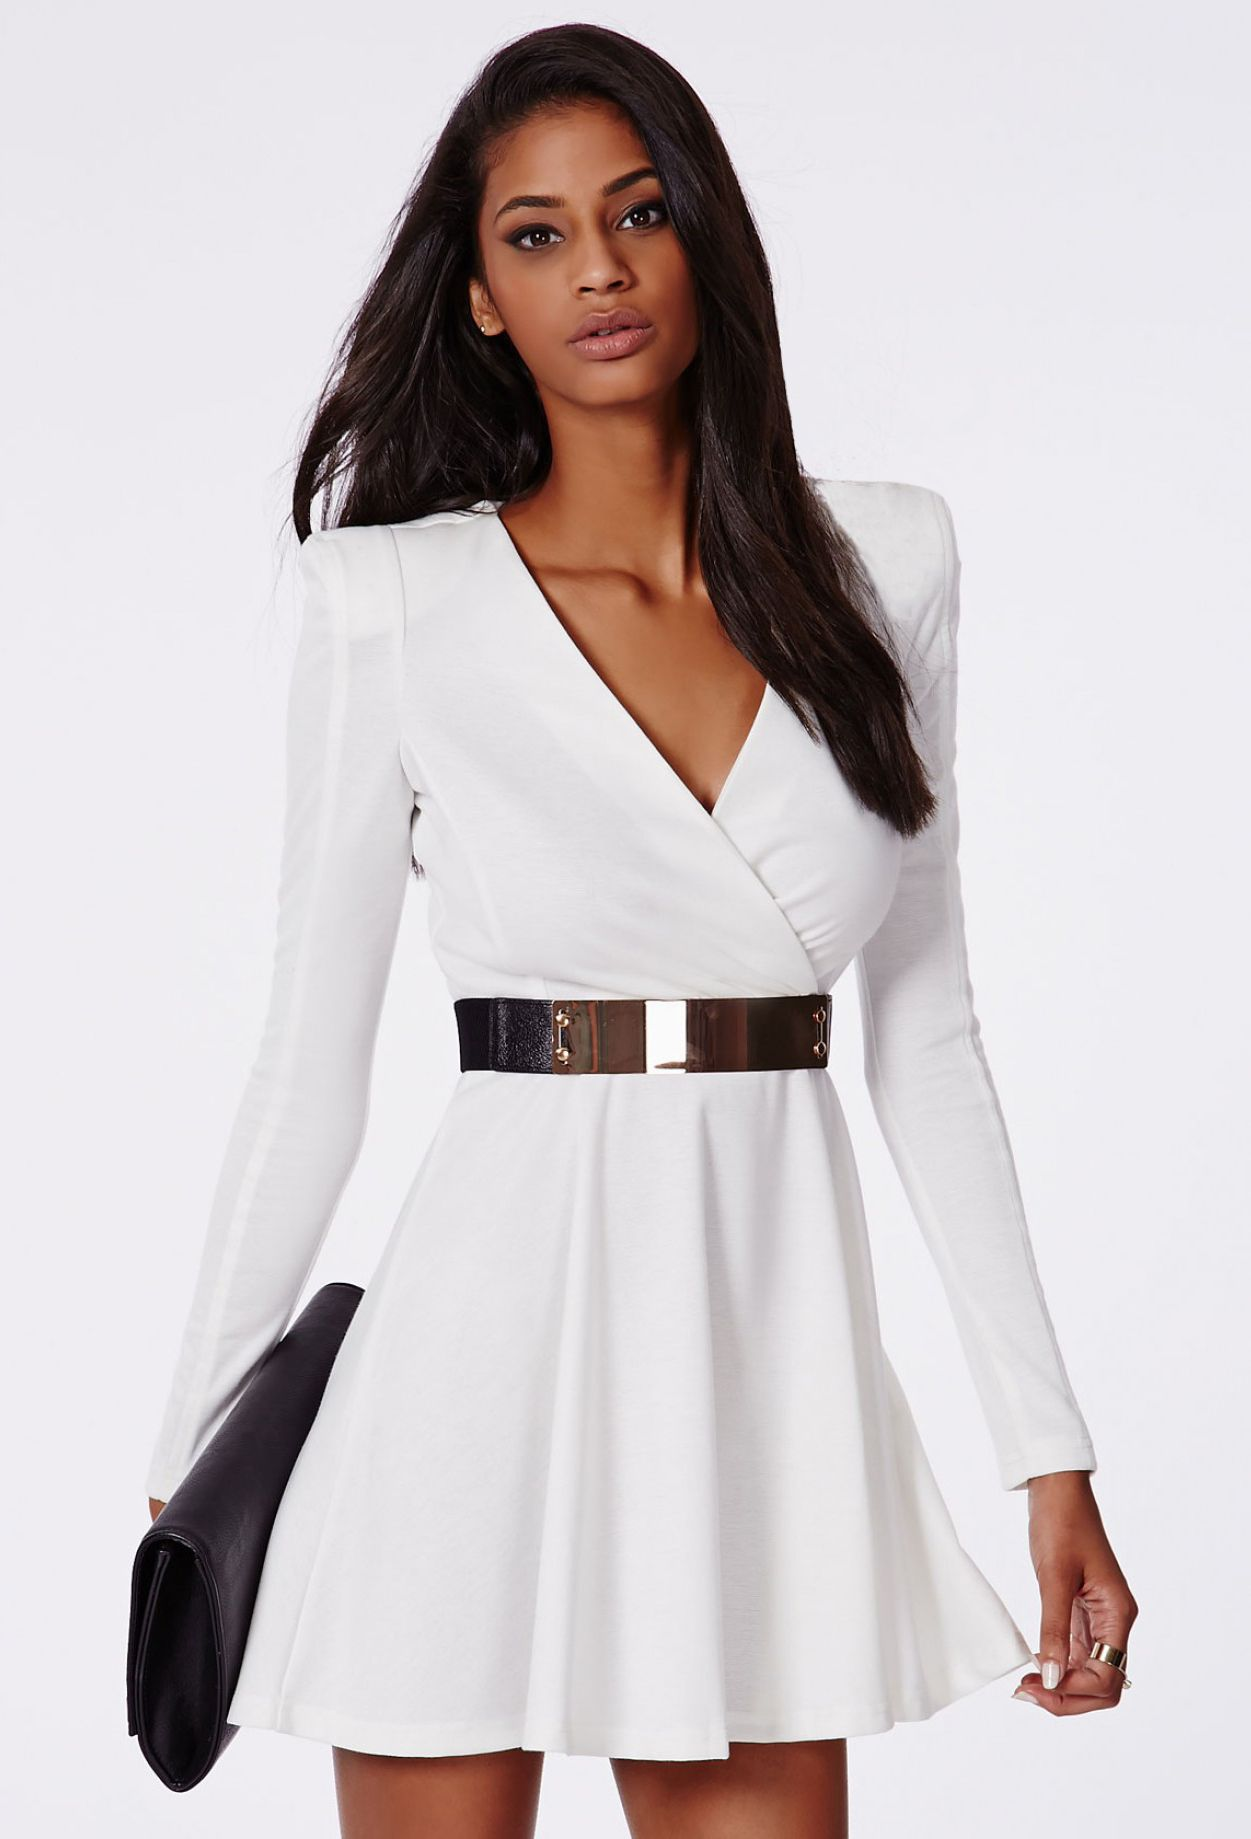 Vestido Cuello Pico Manga Larga Blanco Long Sleeve Casual Dress White A Line Dress Solid Color Dress